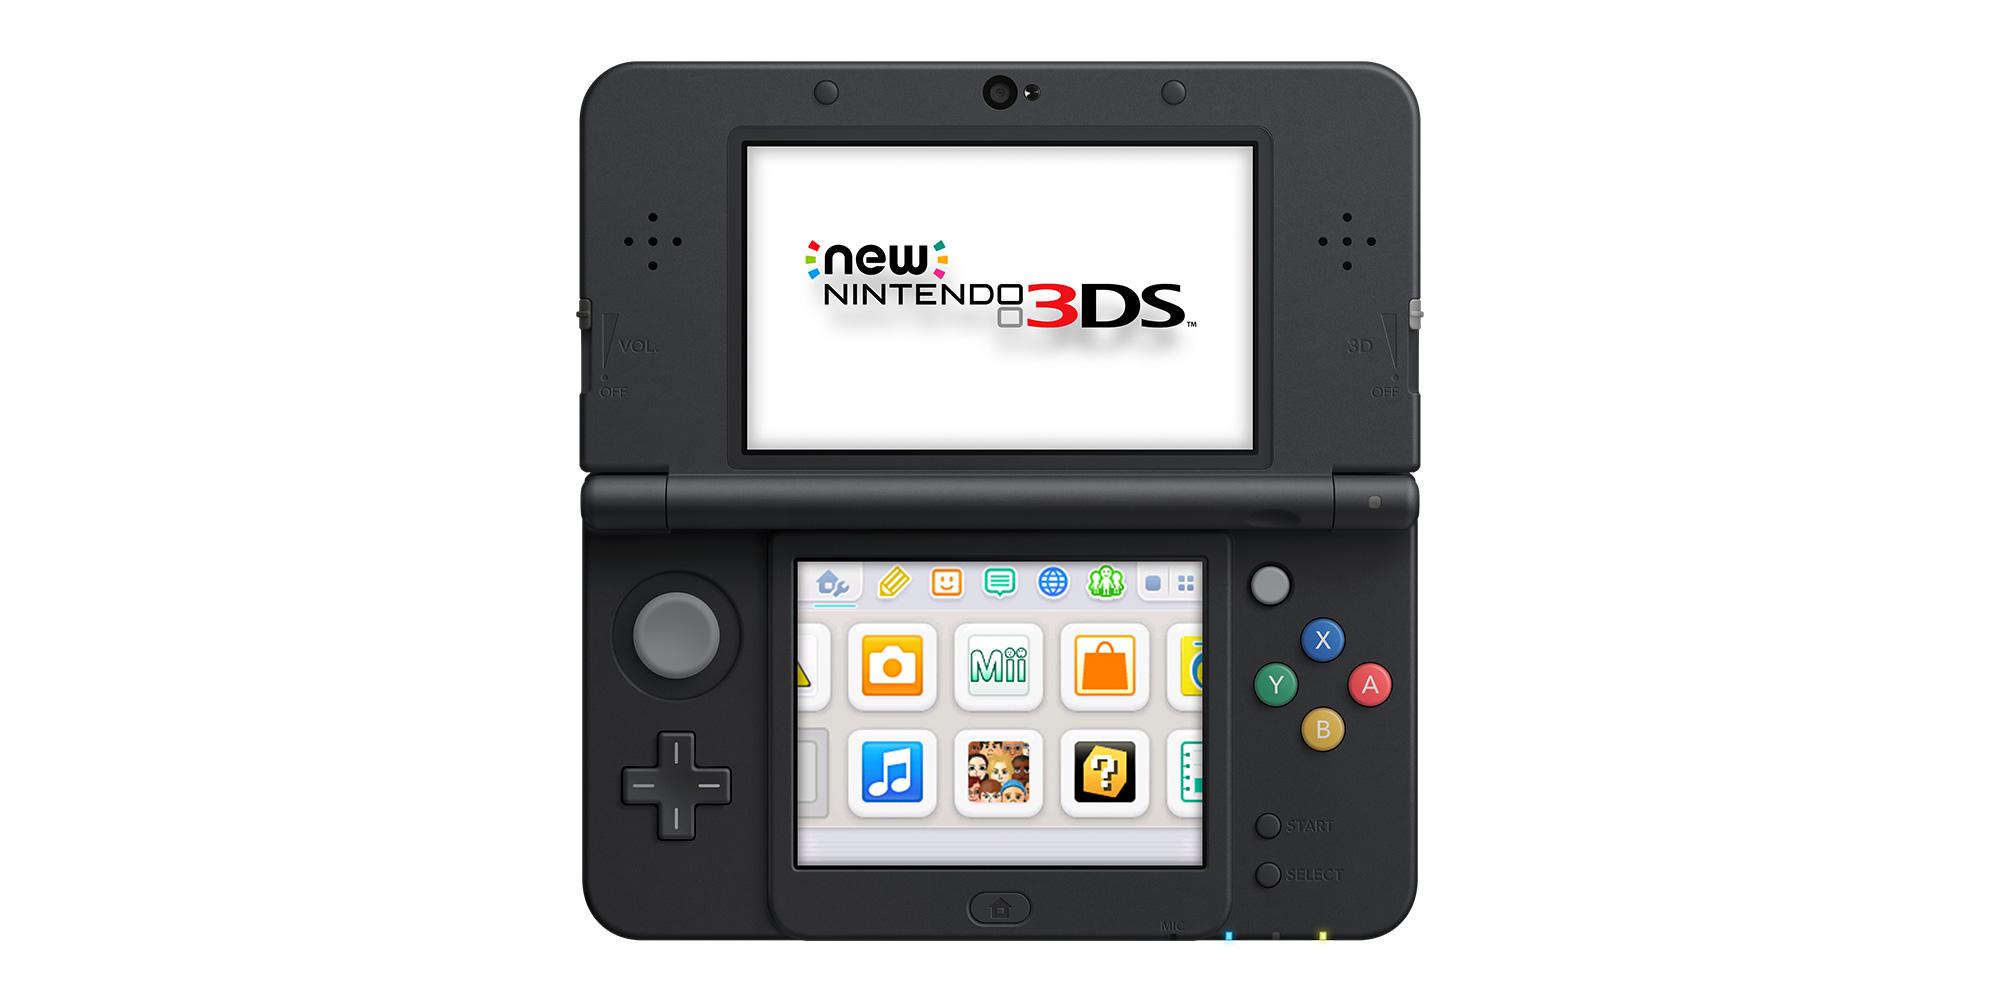 Nintendo 3ds Sd Karte.Support For New Nintendo 3ds Support Nintendo